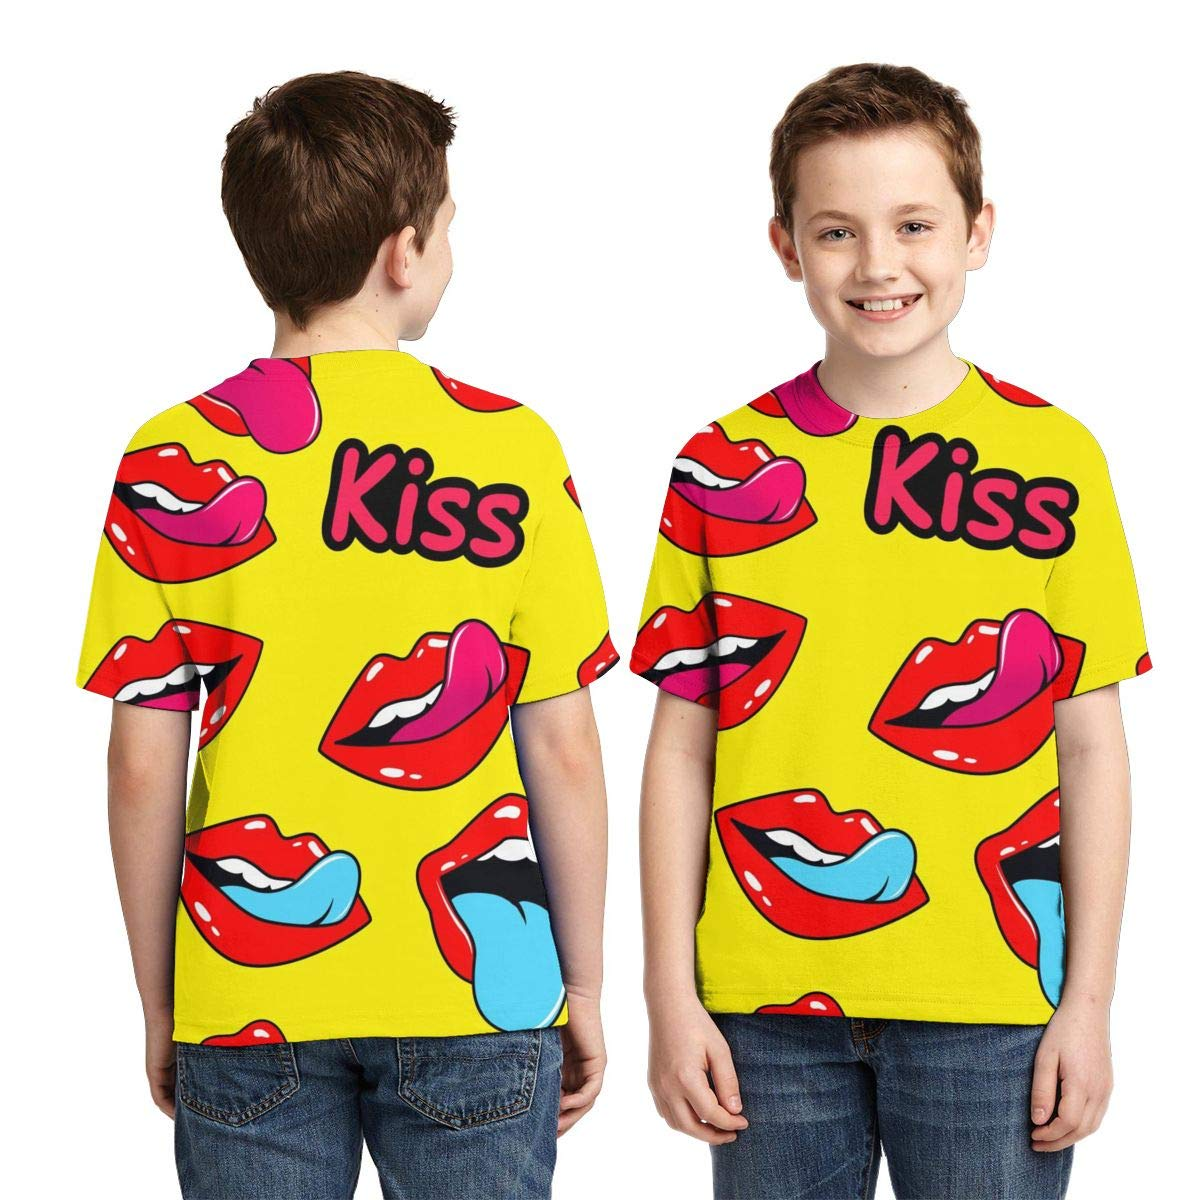 HHTZTCL Lip Drama Kids Print Graphic Tee Short Sleeve T-Shirt